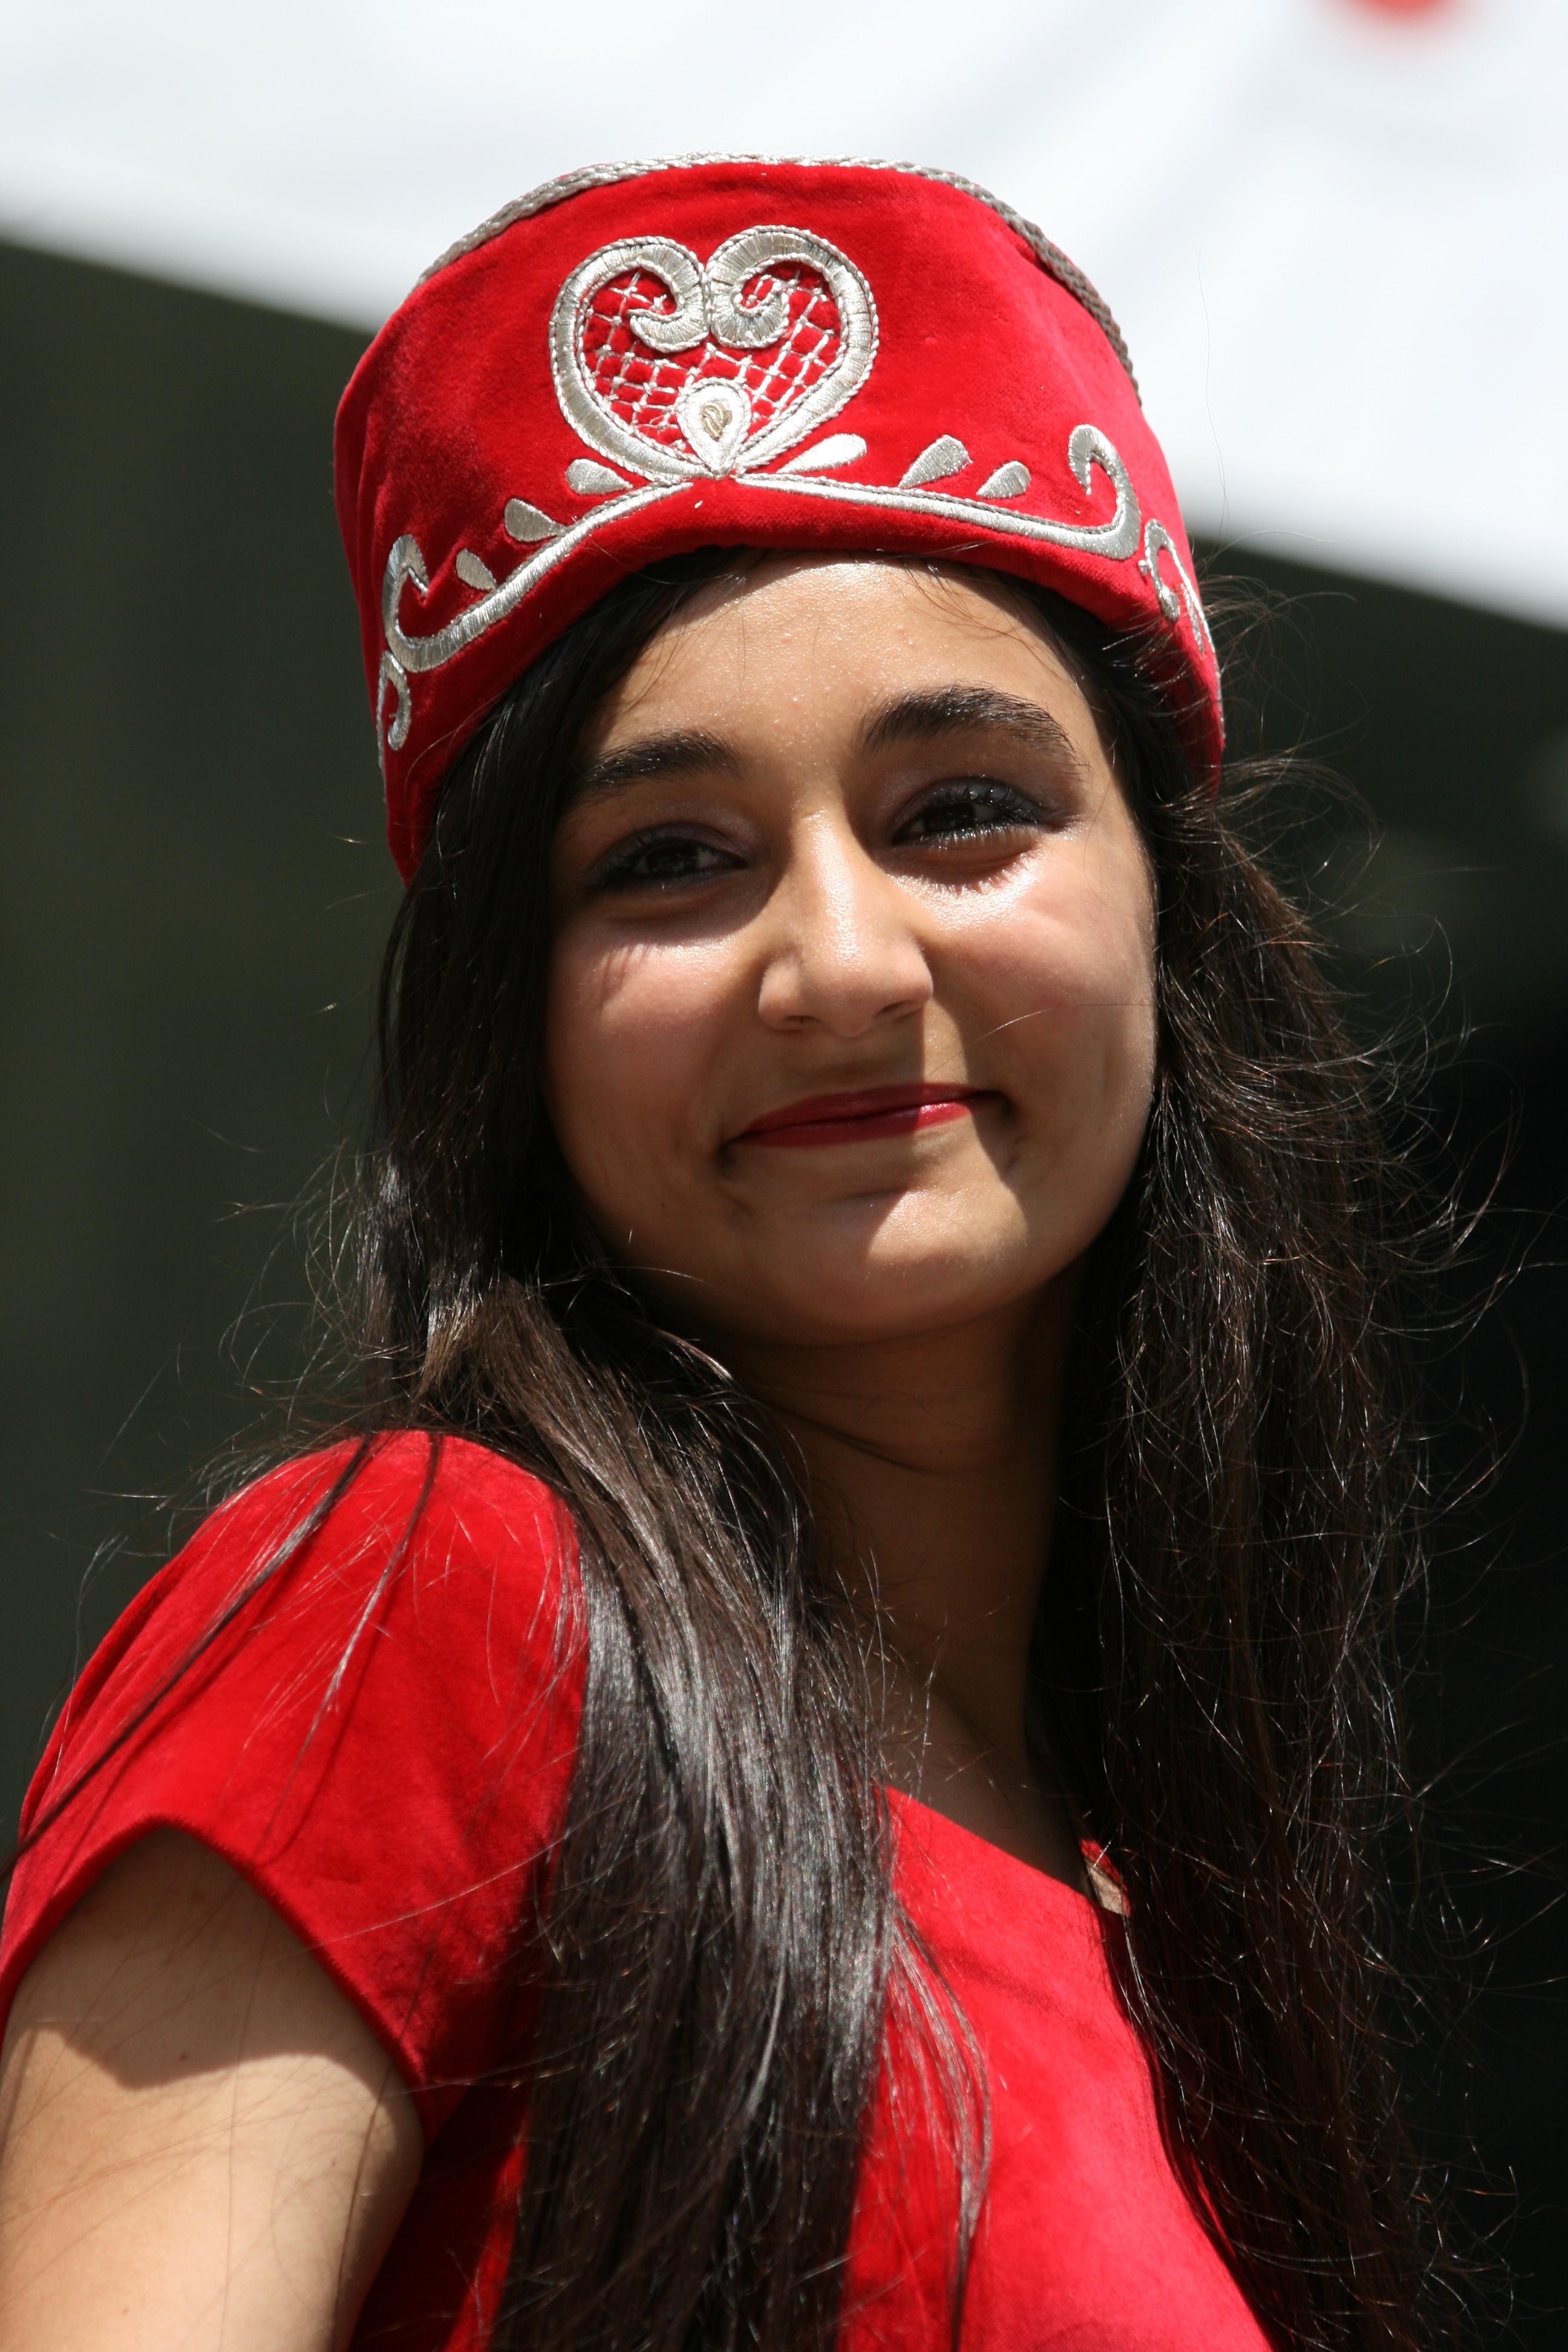 "levant girls Unmute @ezralevant mute @ezralevant follow follow @ezralevant following ezra levant 🇨🇦  verified ""mao saw boys and girls in."